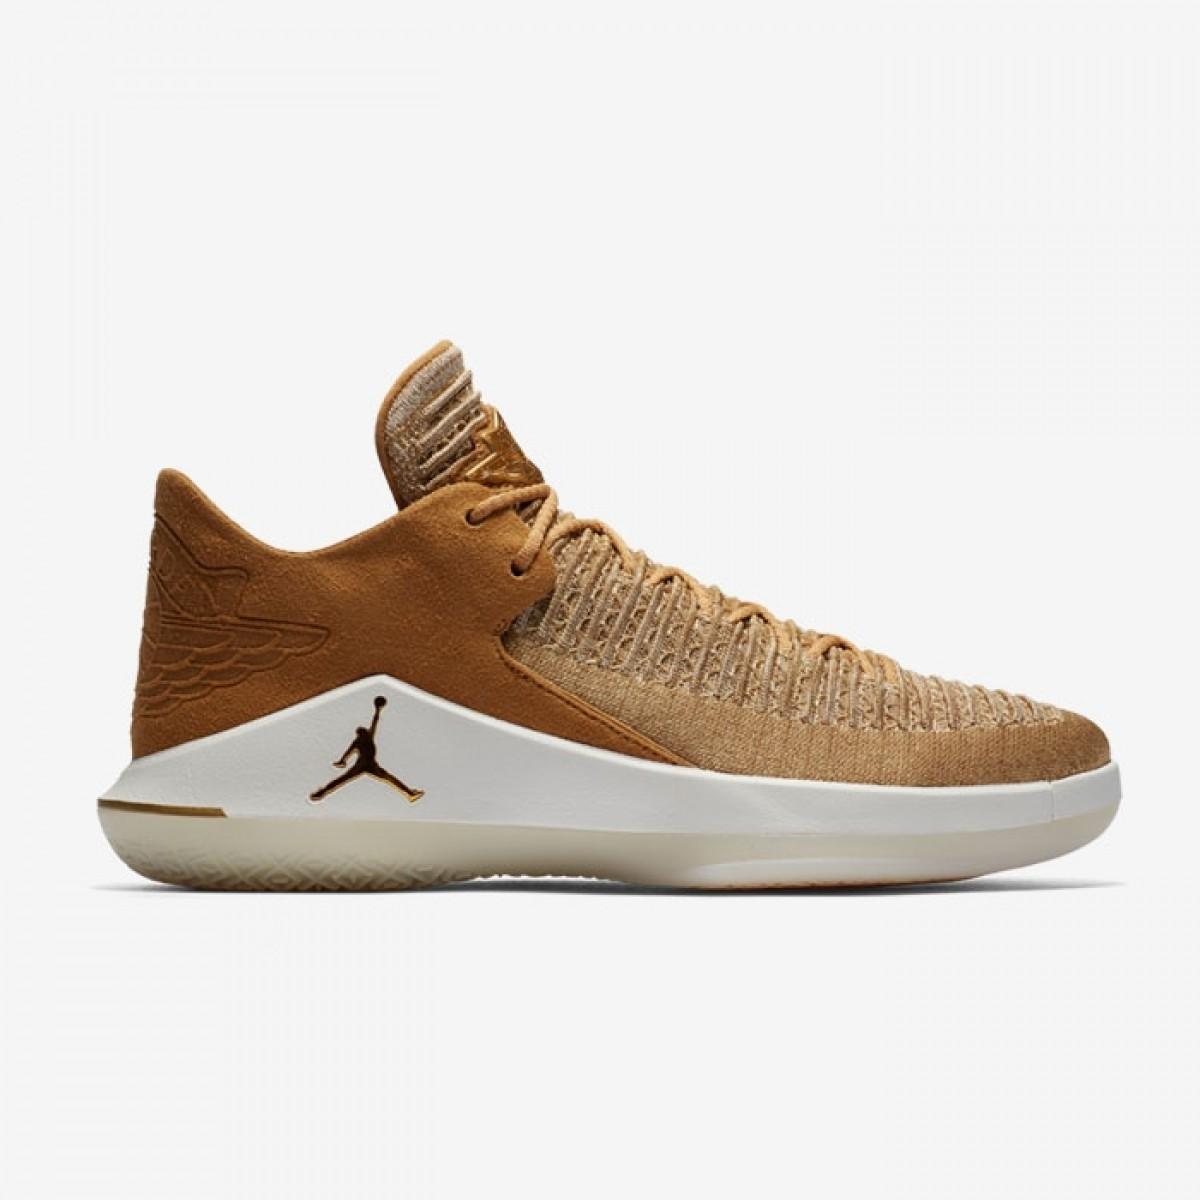 Air Jordan XXX2 Low 'Wheat'